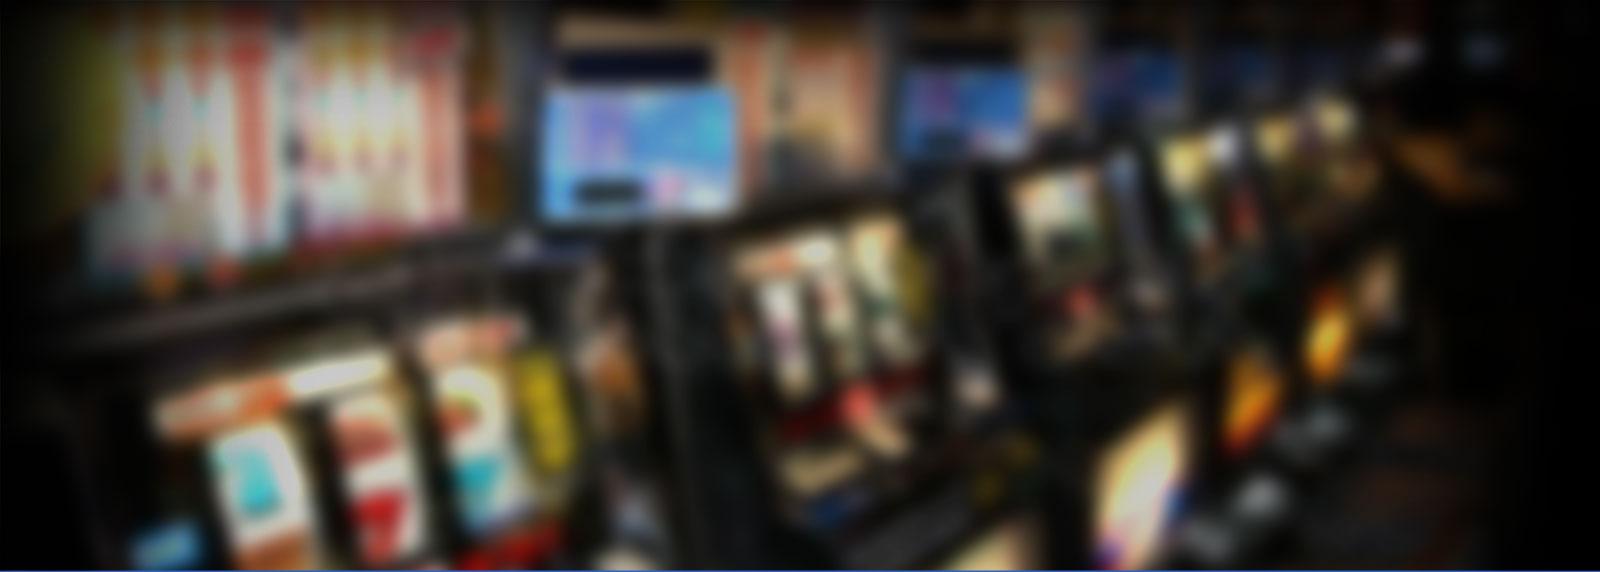 Casino en ligne : s'informer avant de jouer